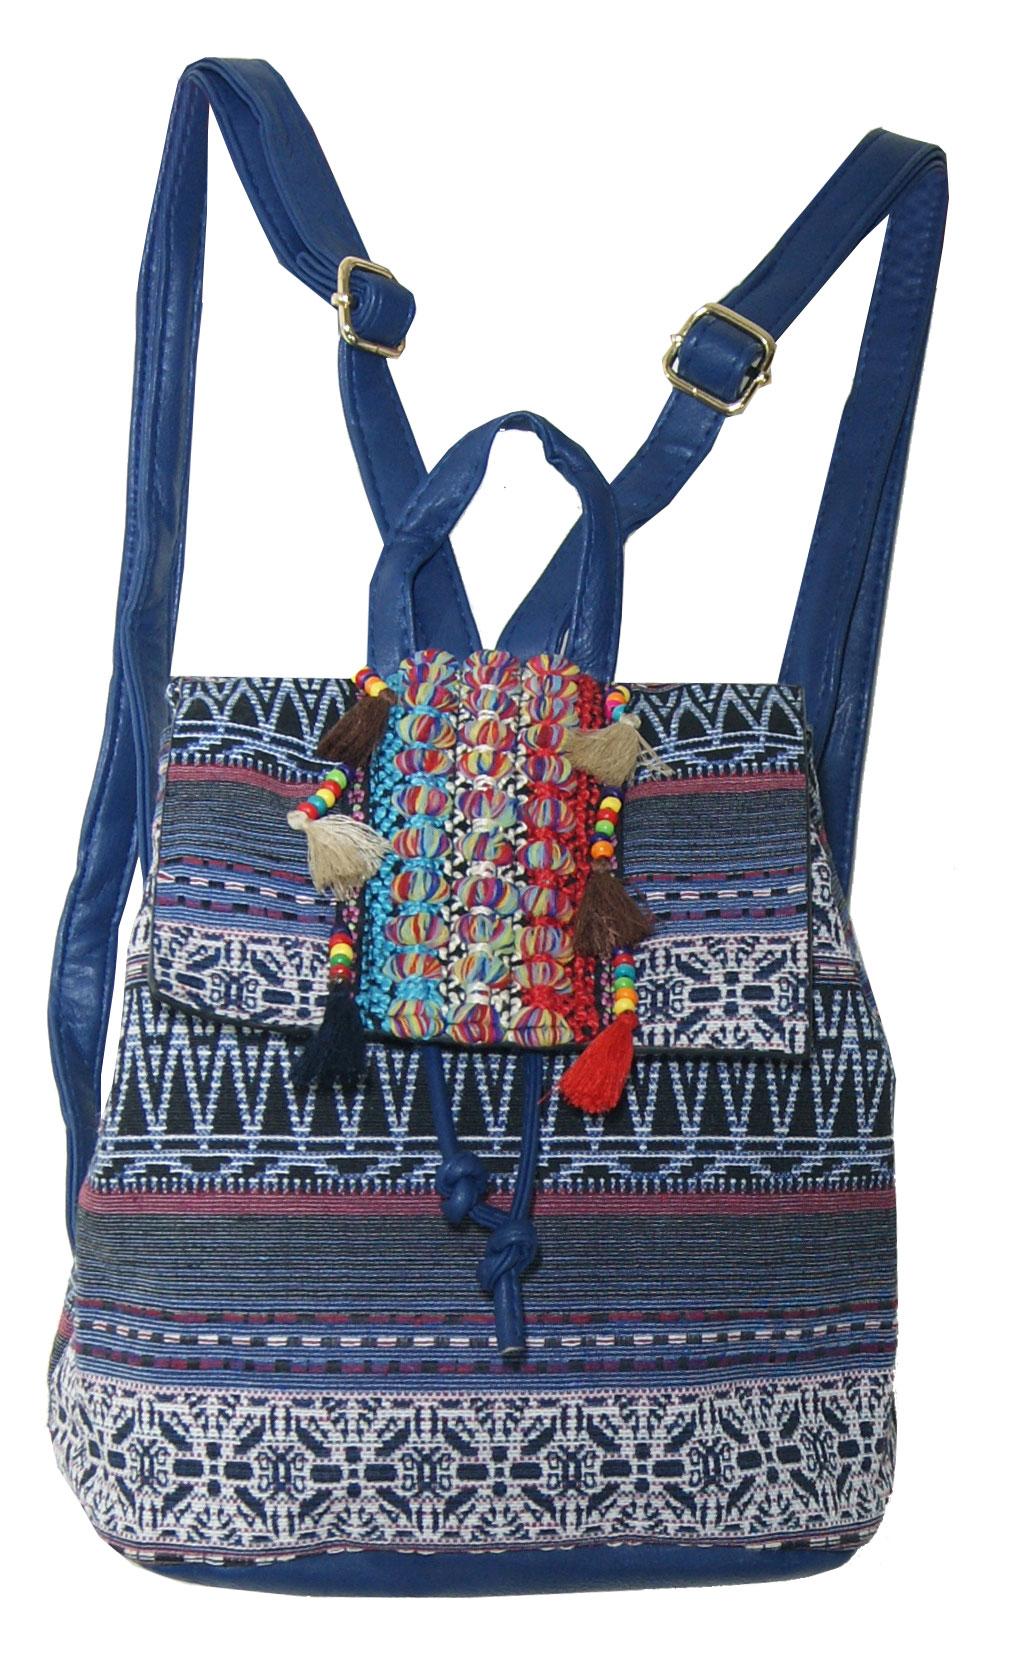 Backpack No 1012-3 (jessica κωδ.: 1012-13)